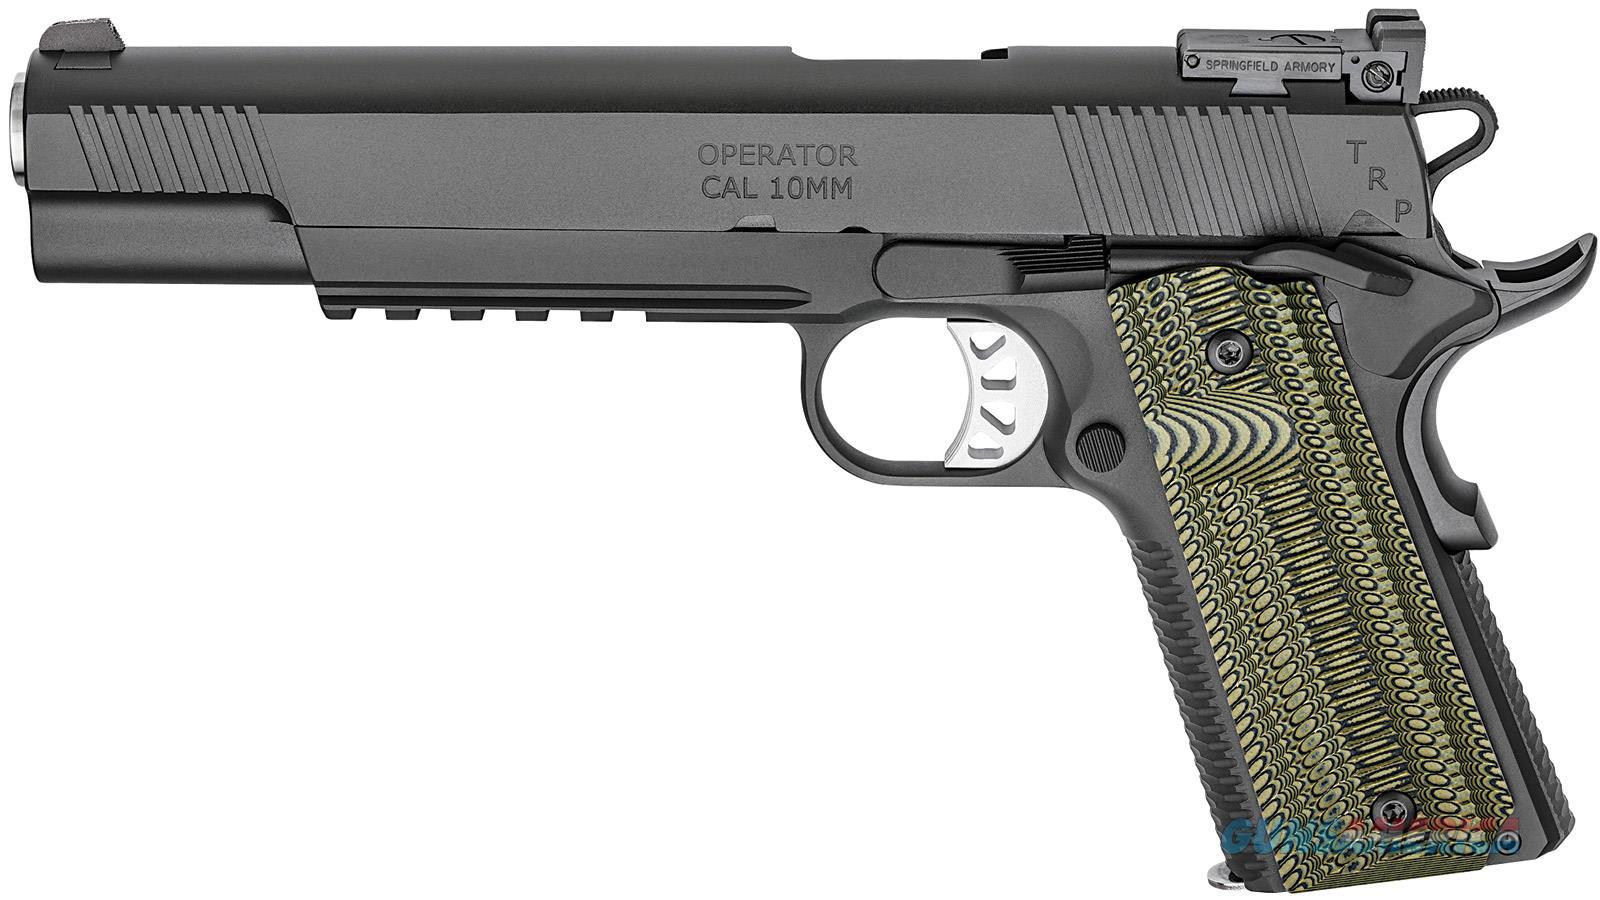 Springfield Armory Trp 10Mm Longslide Ns Tactical Response PC9610L18  Guns > Pistols > S Misc Pistols